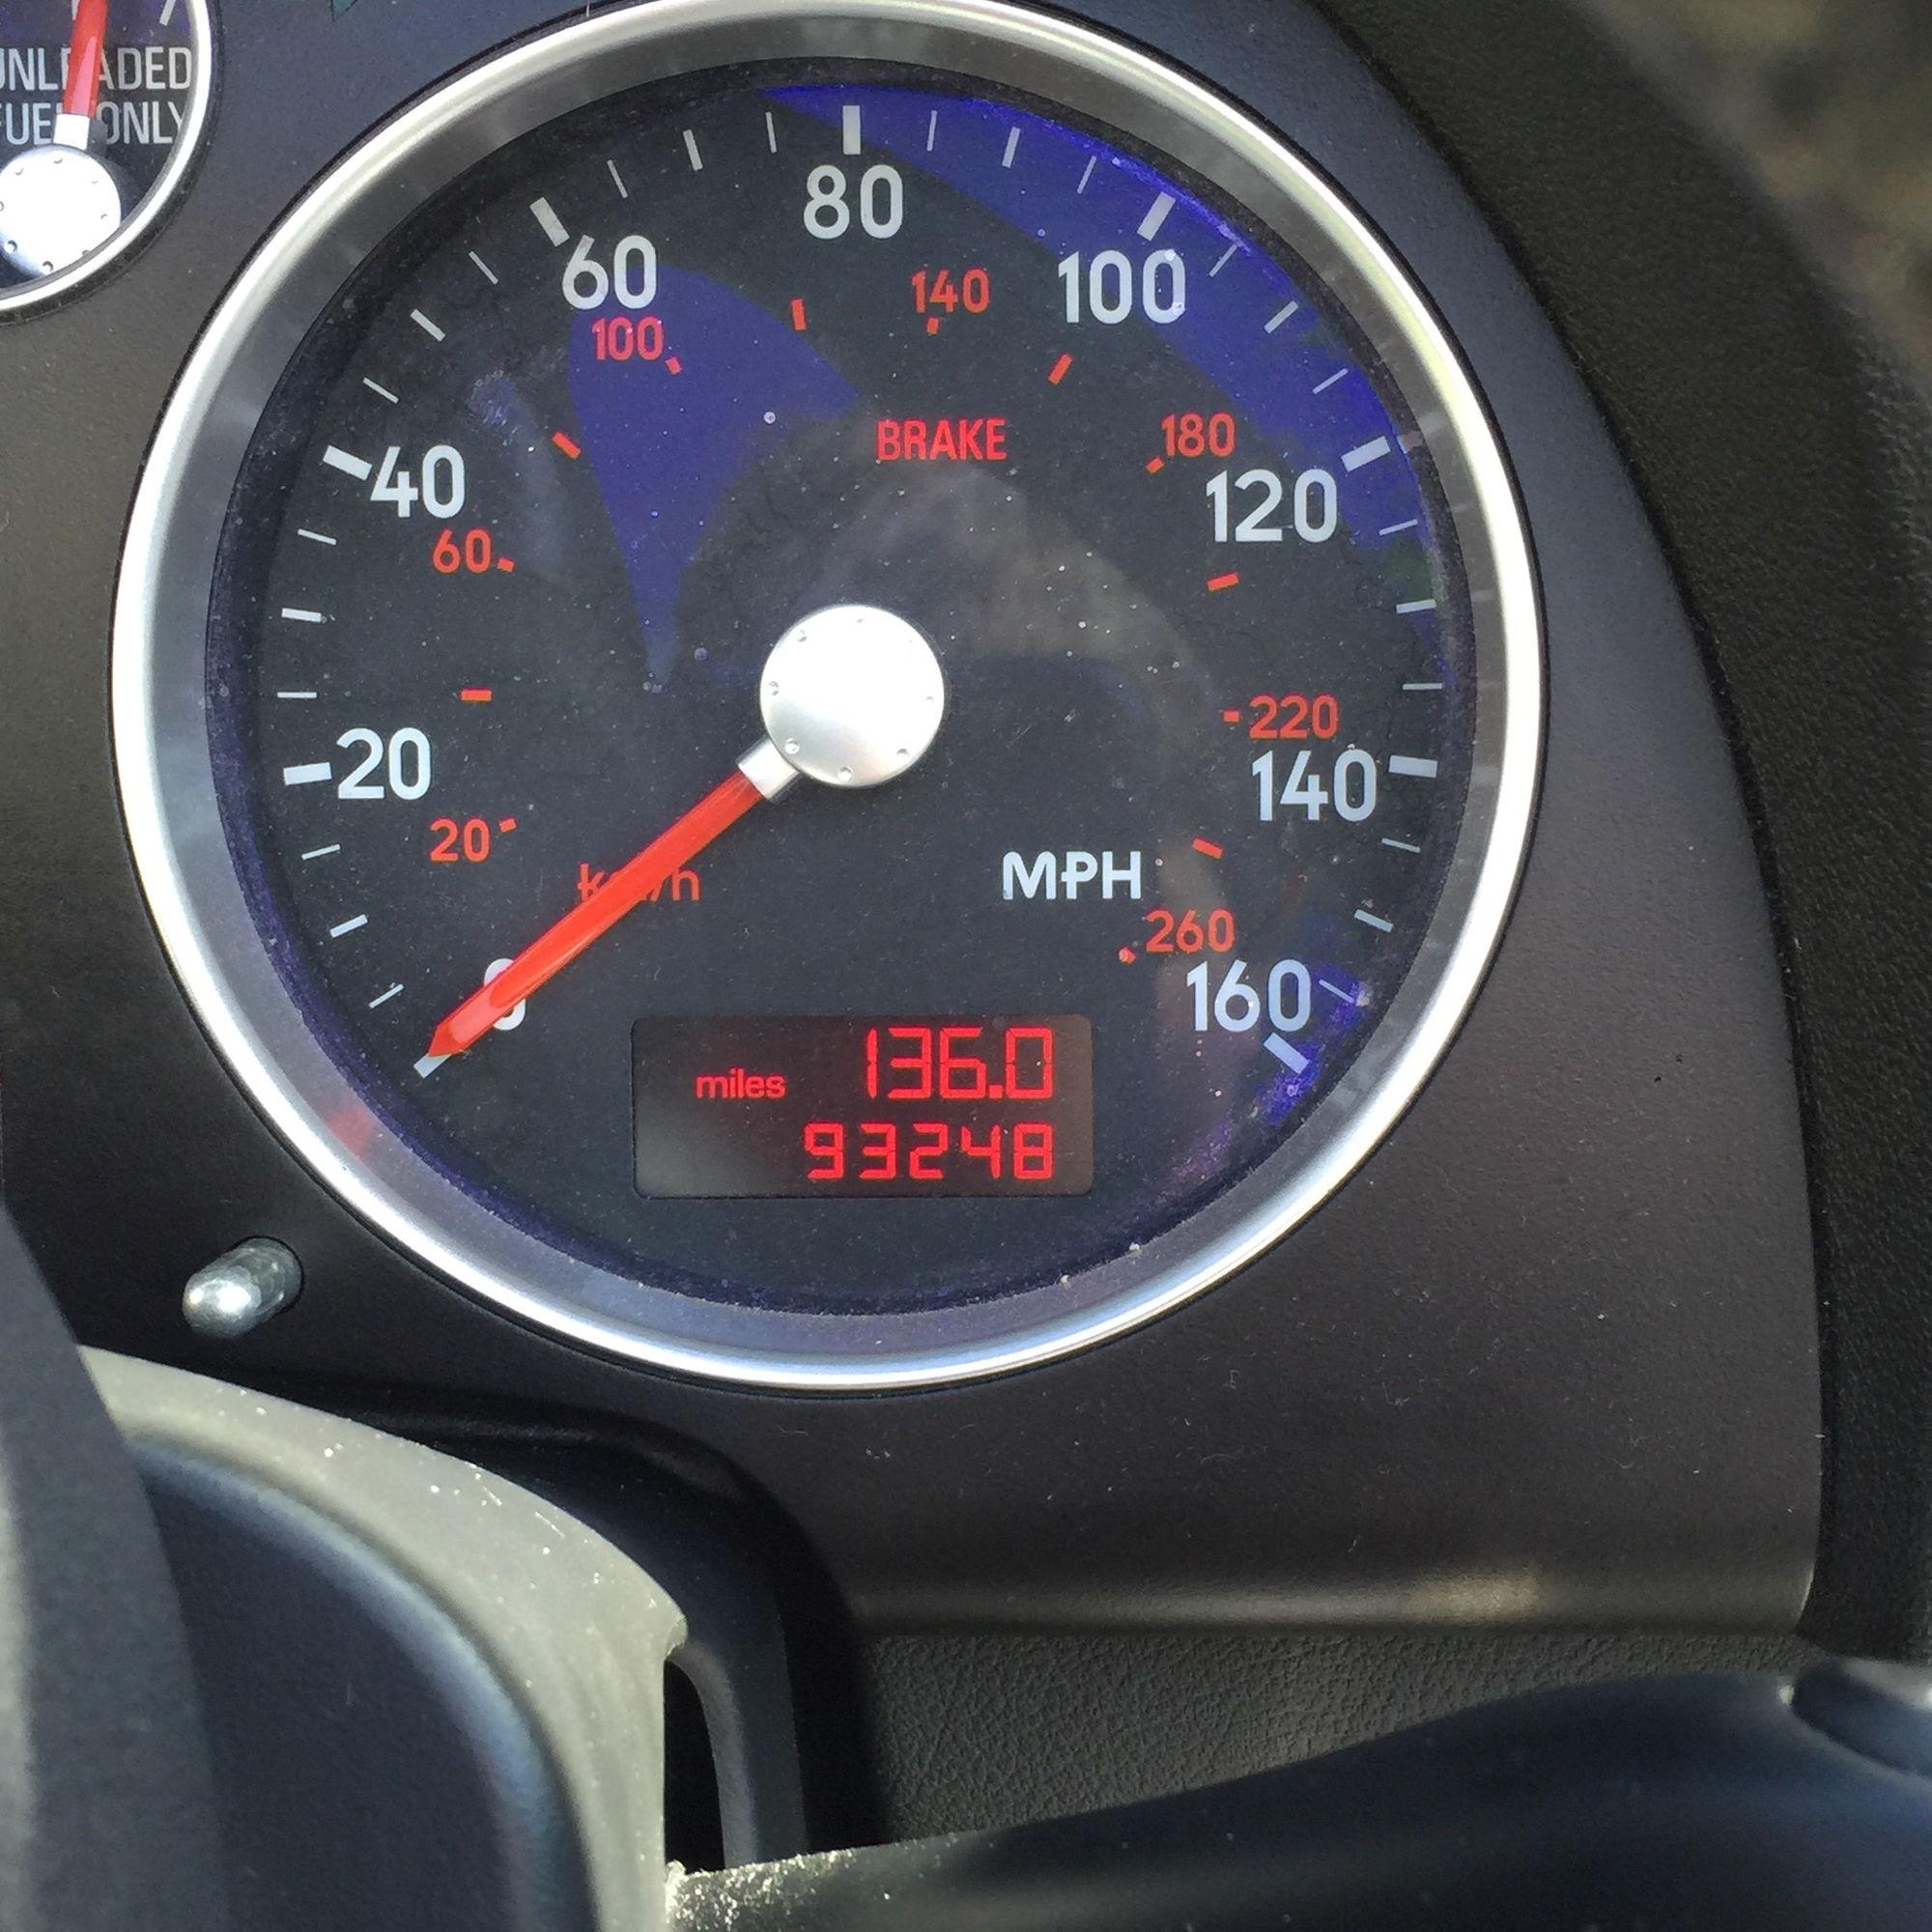 Audi TT 2001 Roadster